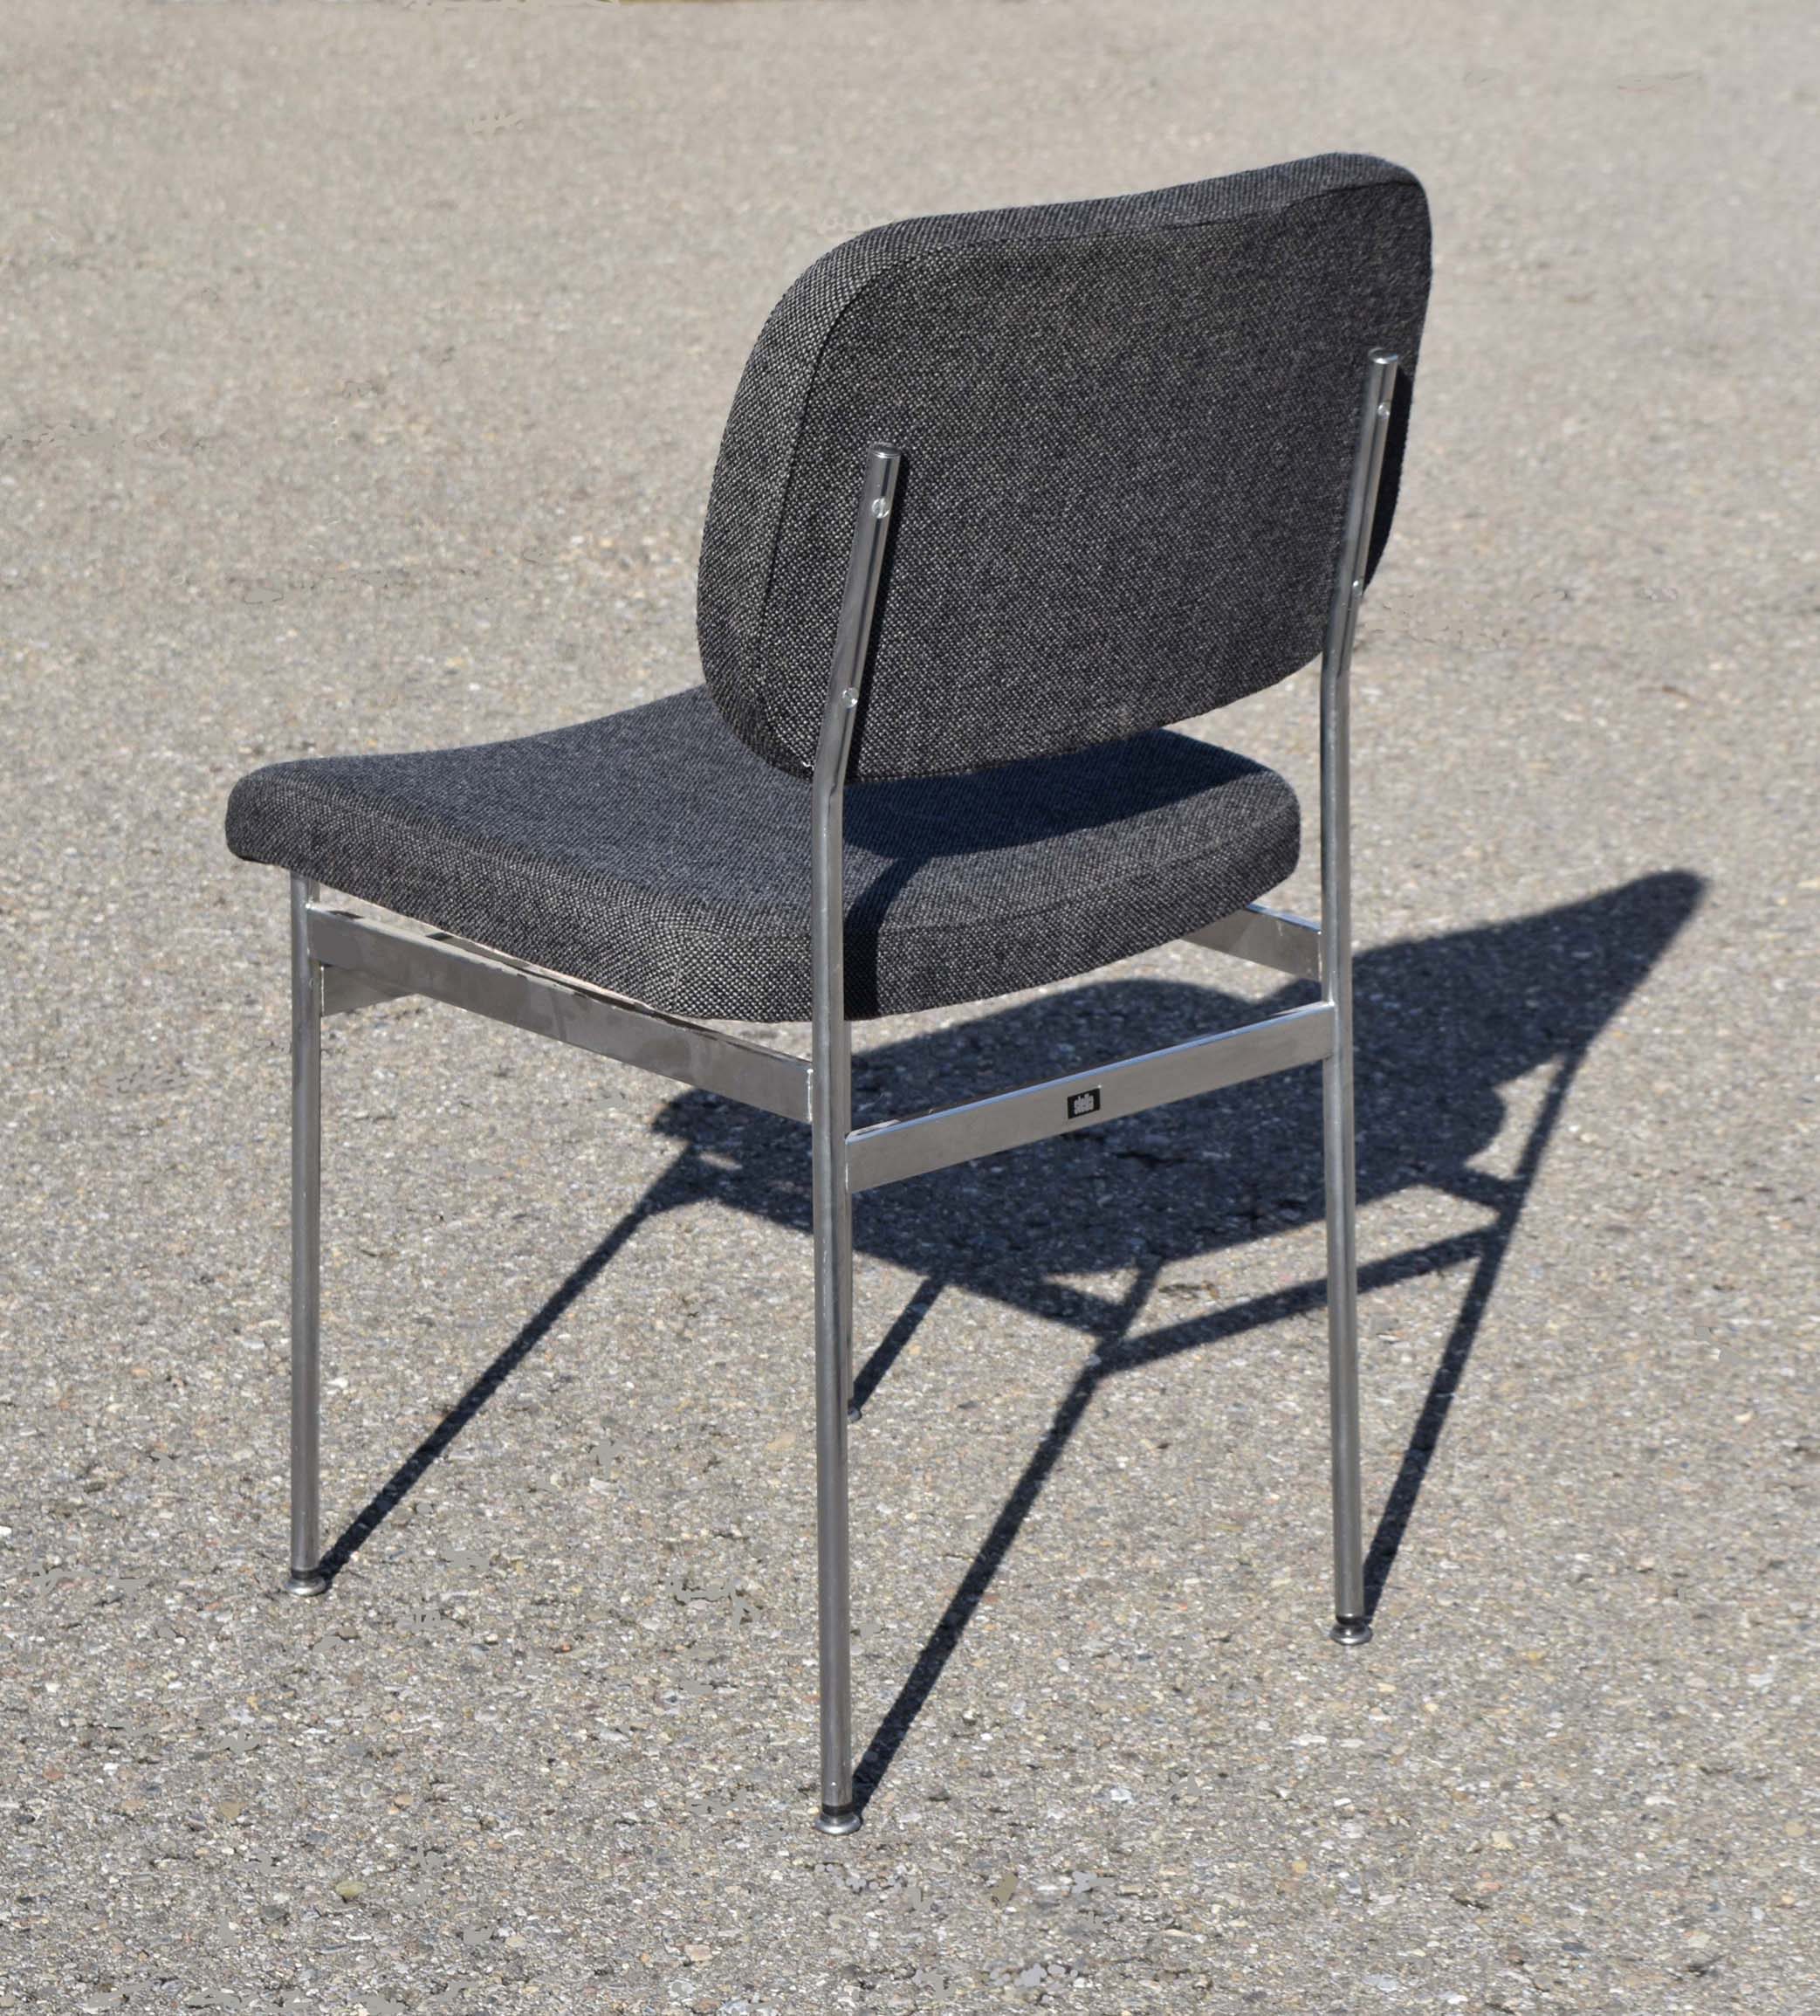 chaise eames suisse latest vitra la chaise eames dessin au trait with chaise eames suisse. Black Bedroom Furniture Sets. Home Design Ideas